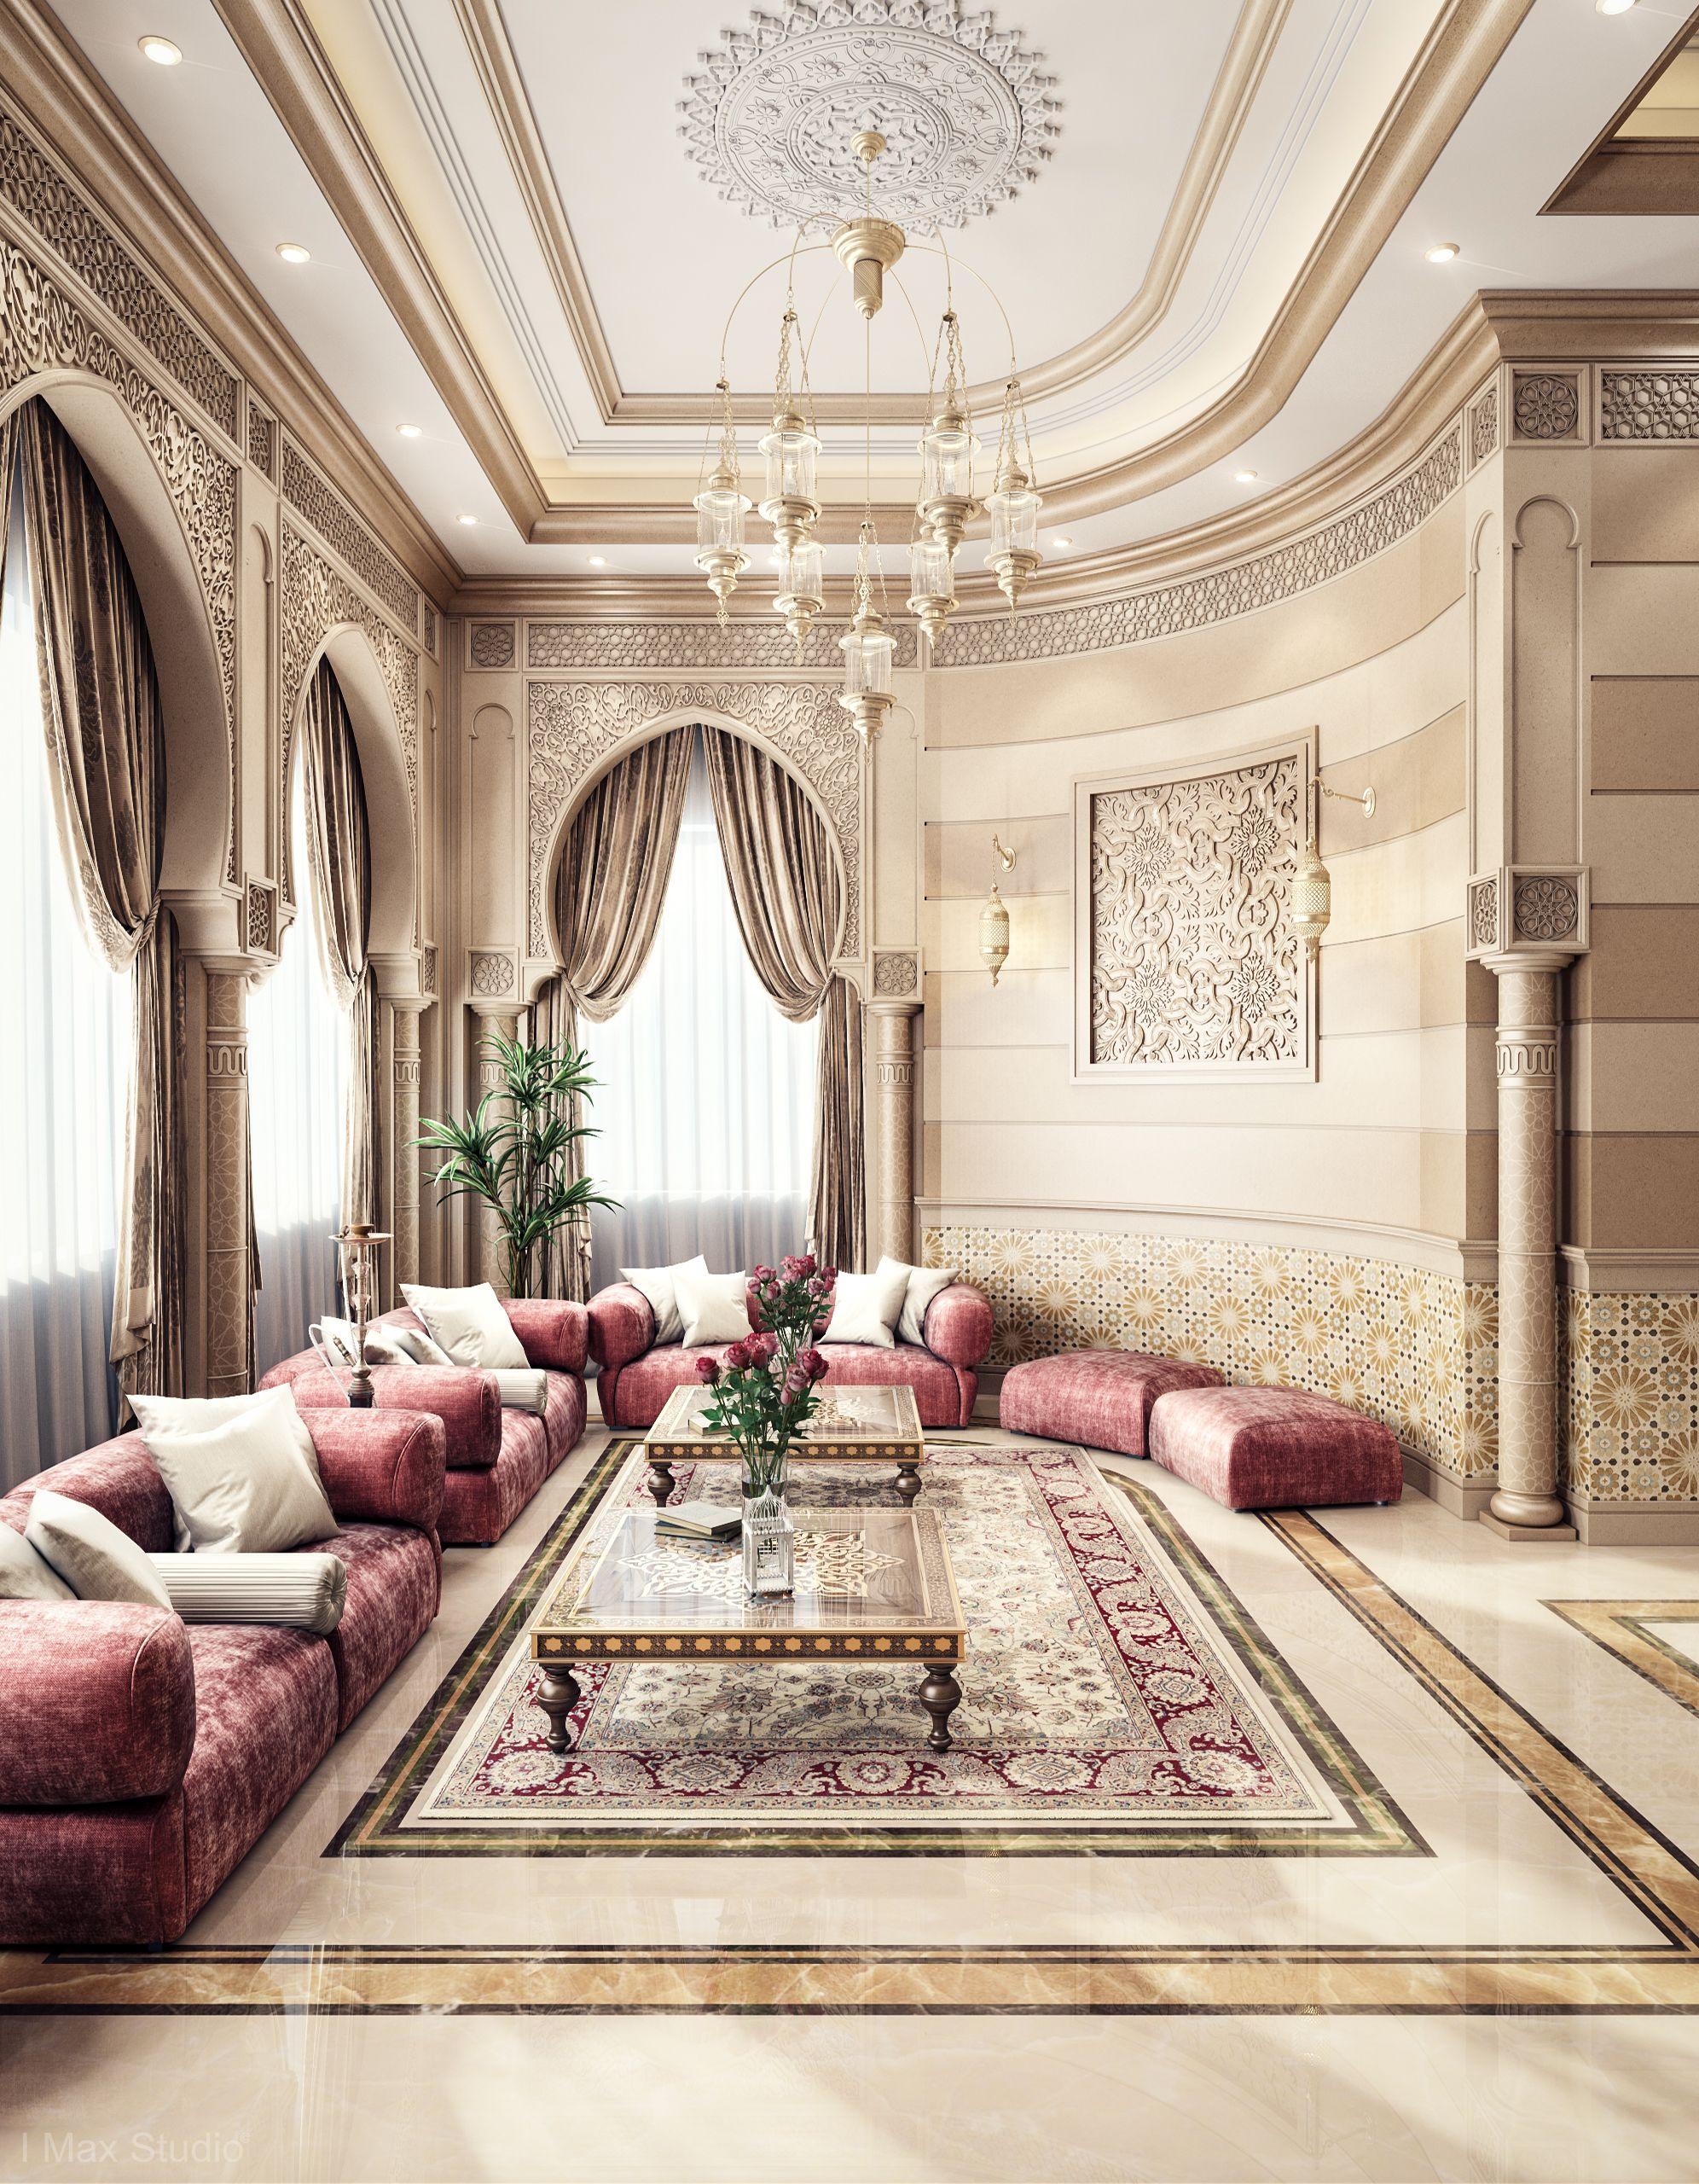 arabian style living room - 736×945